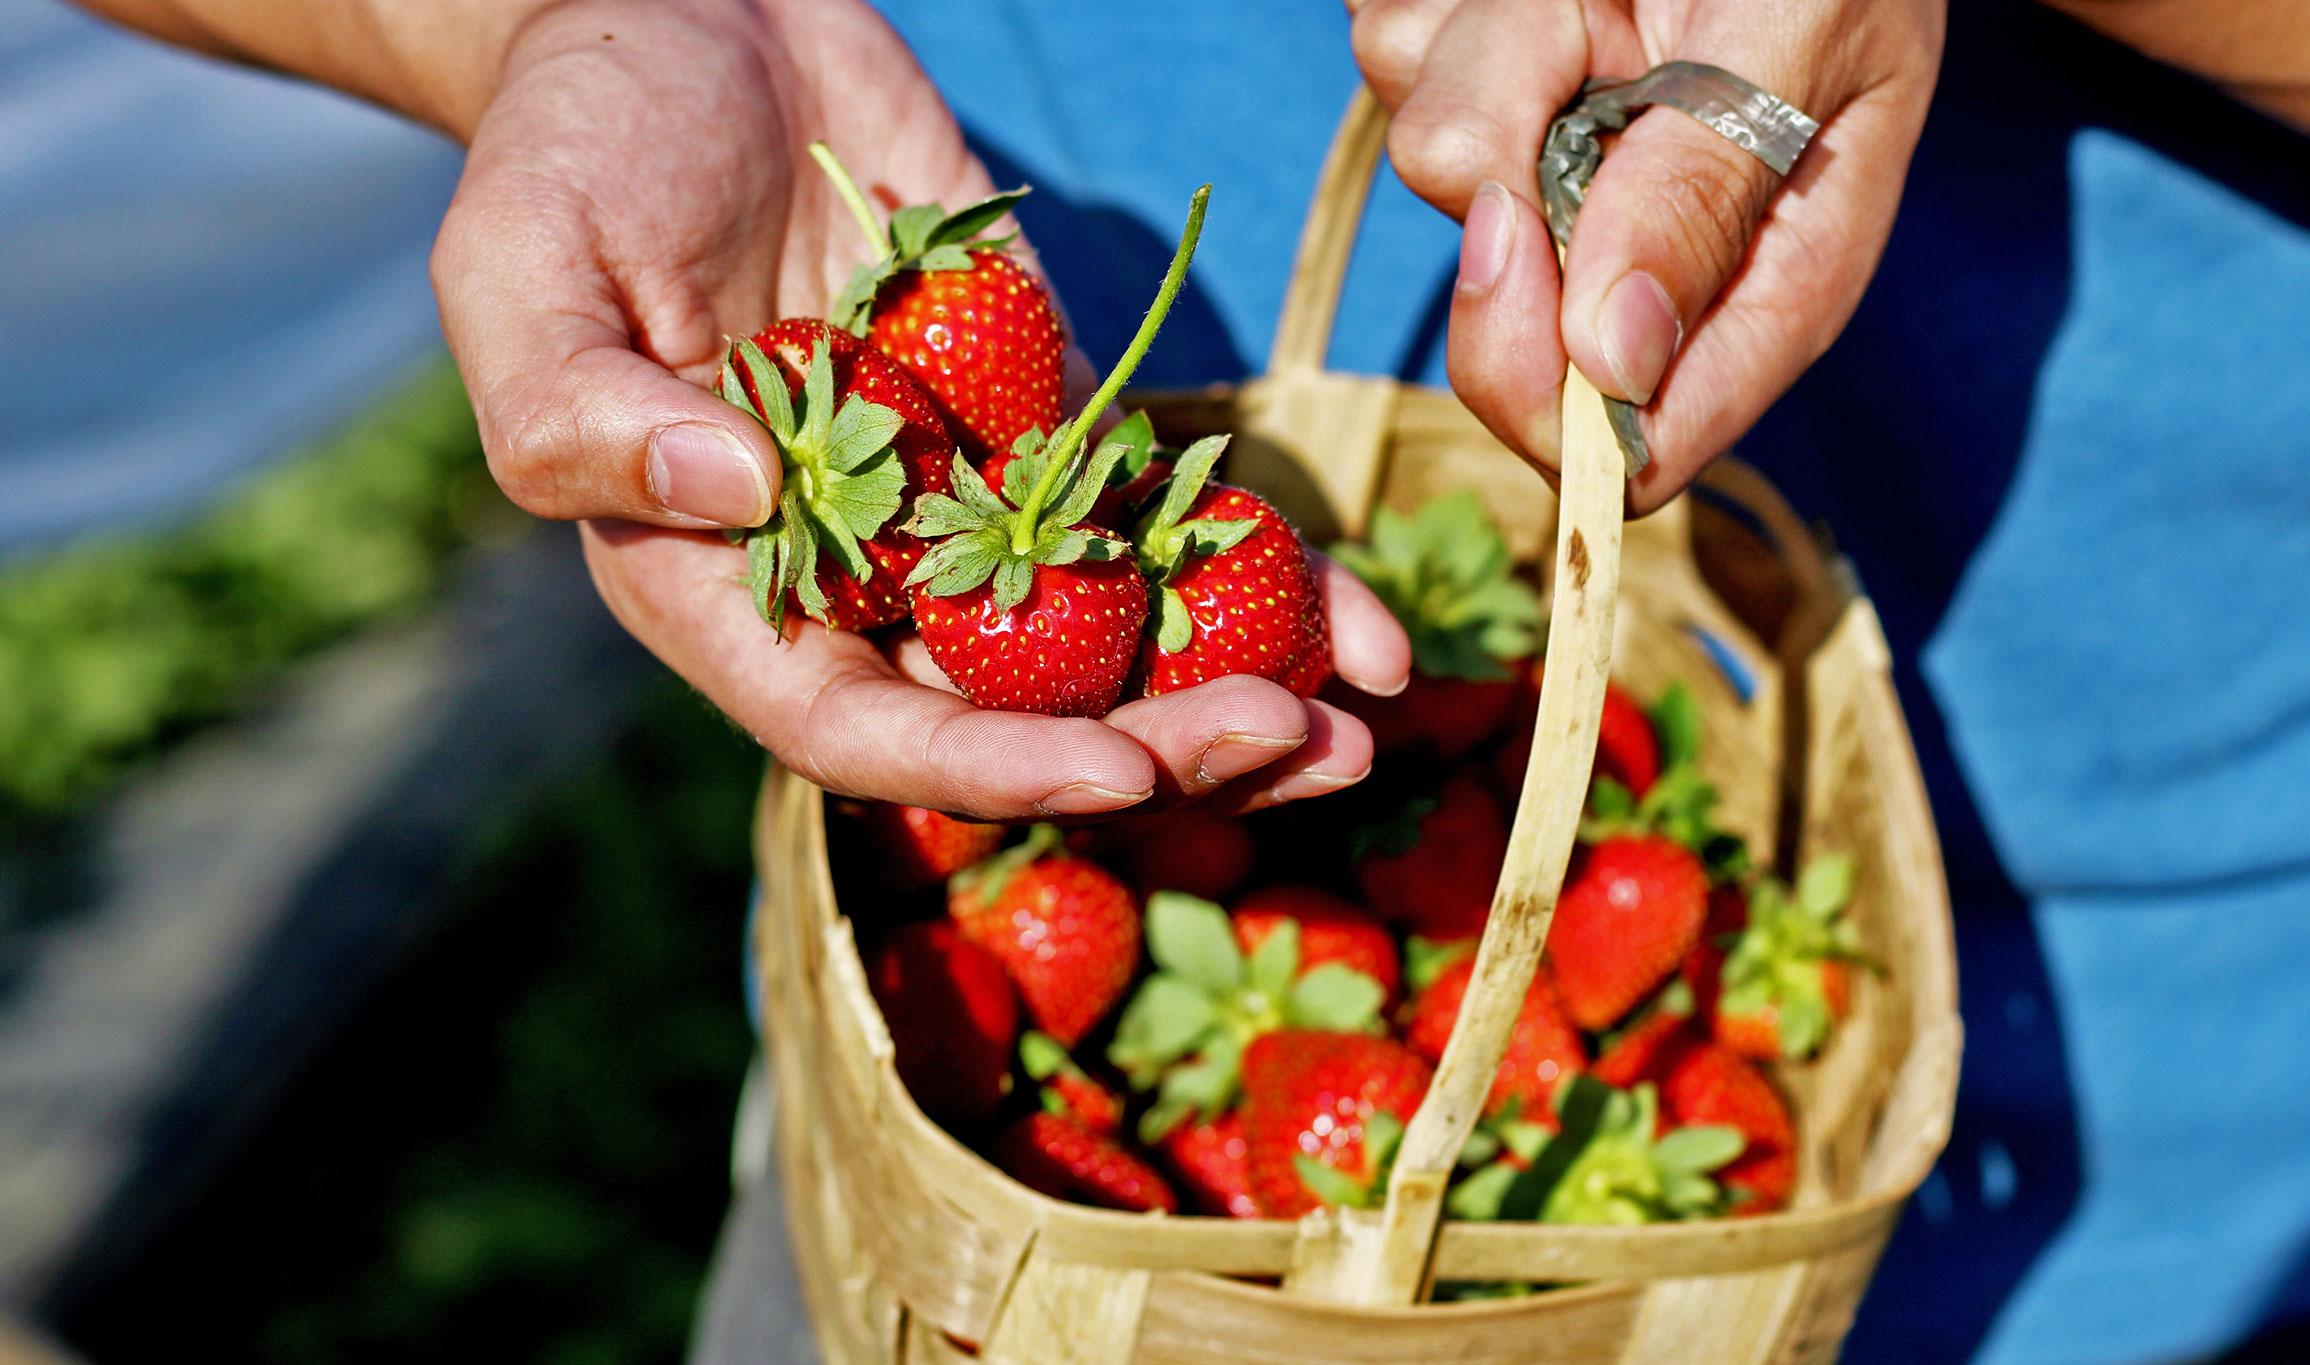 Freshly picked strawberries from Benguet